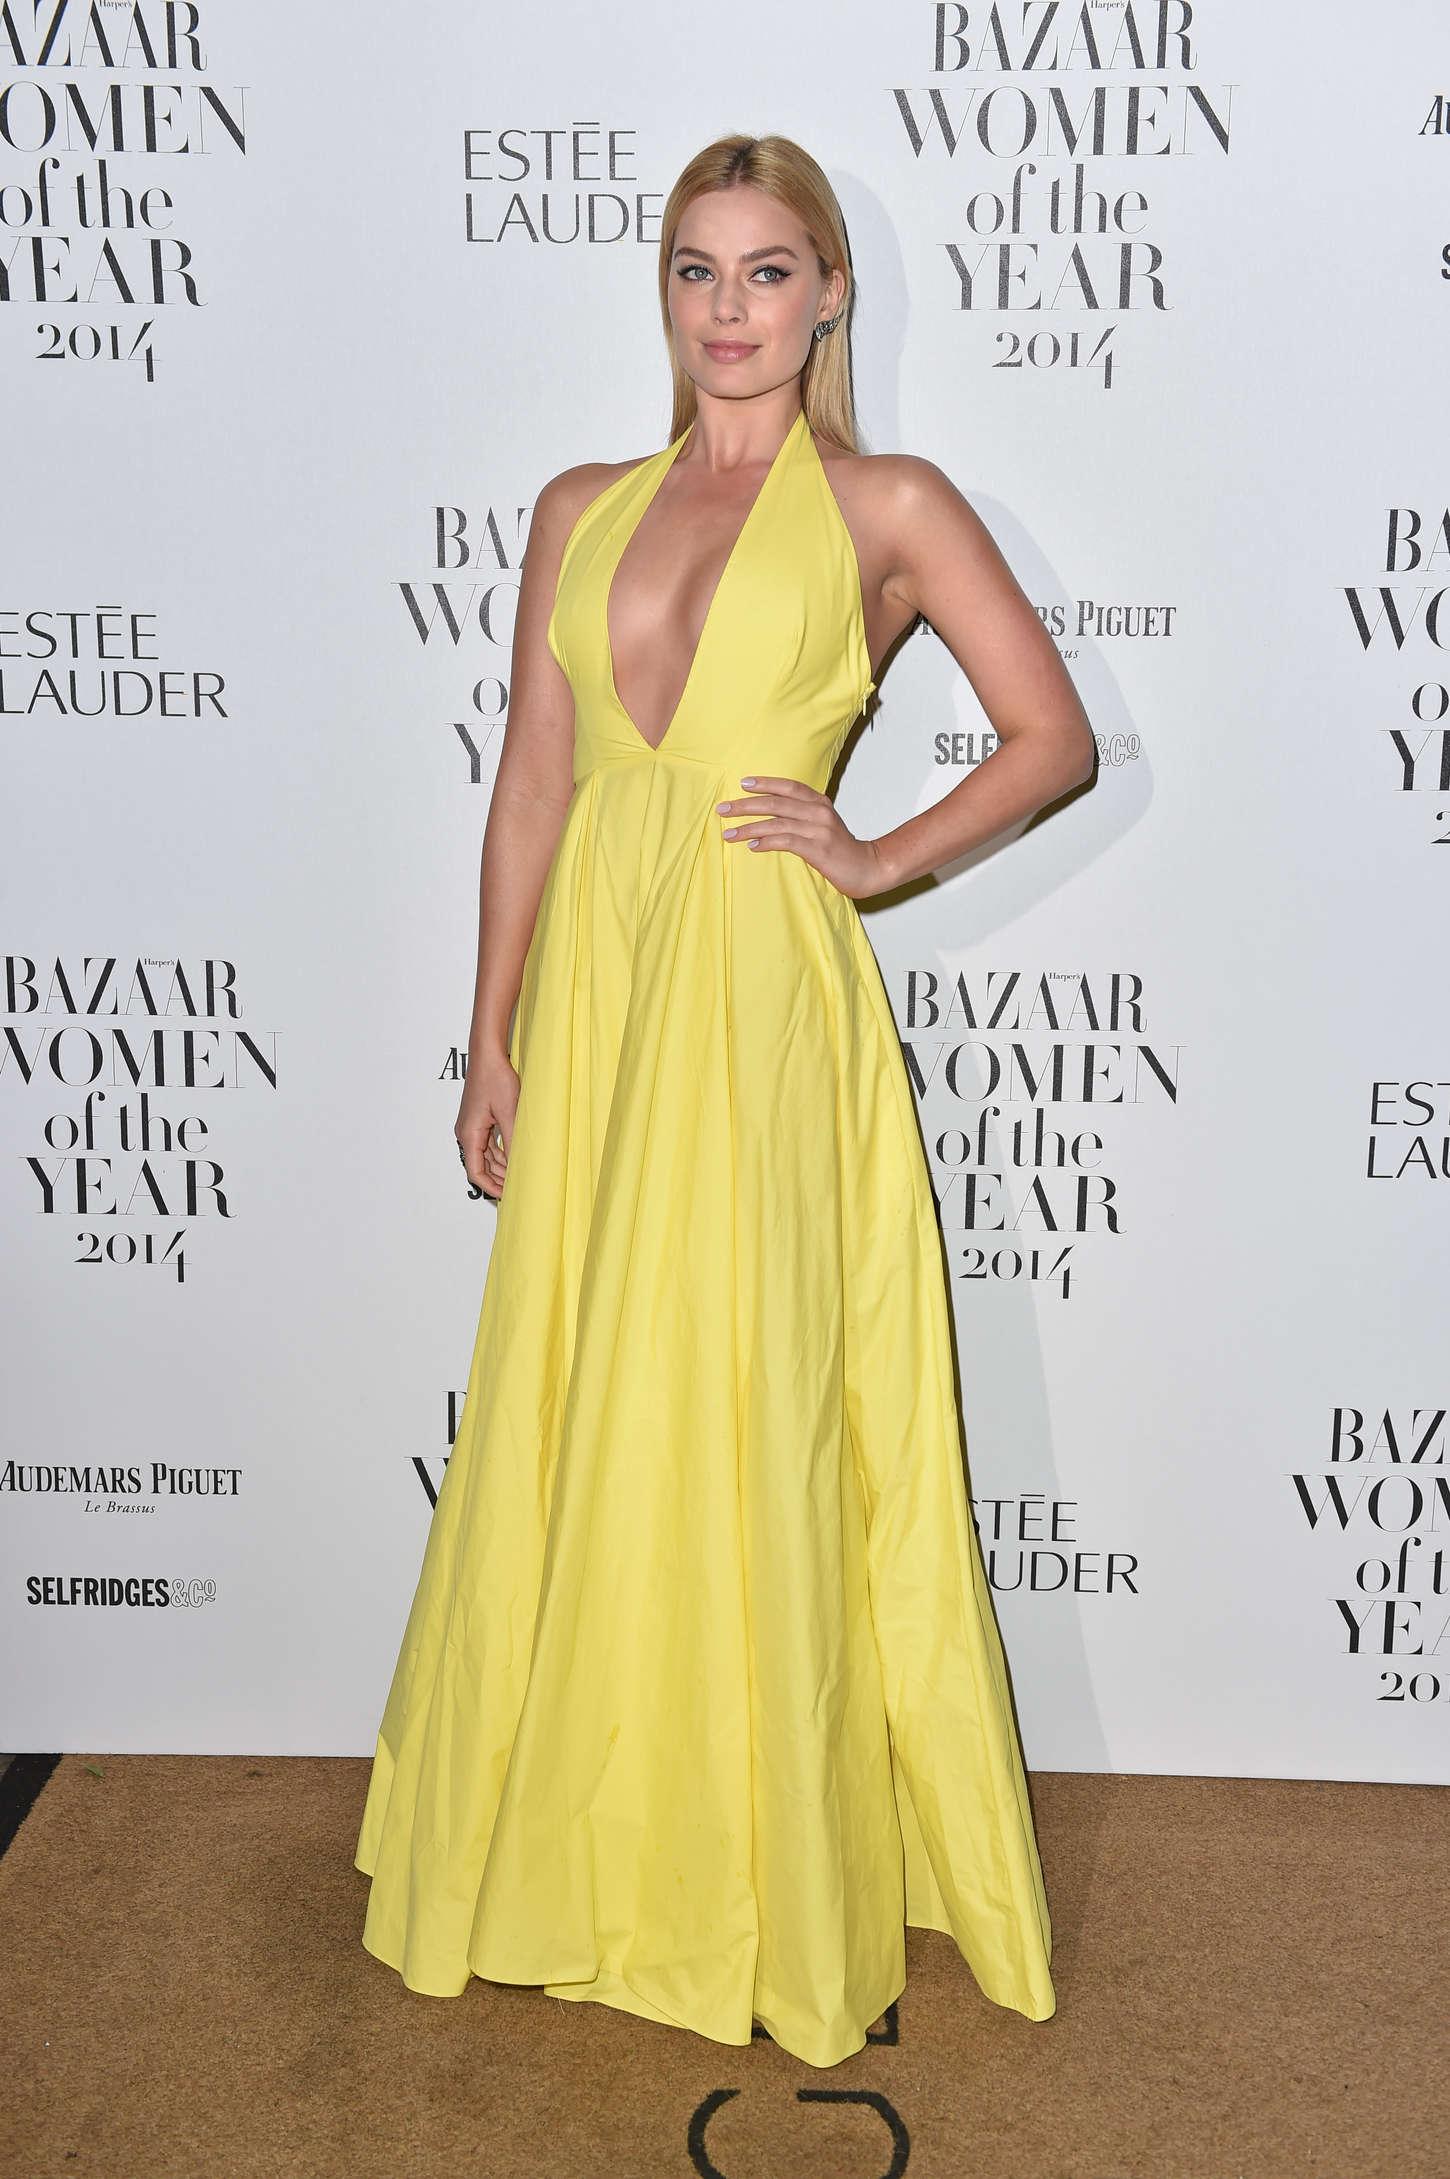 Margot Robbie - Harper's Bazaar Women of the Year Awards 2014 in London